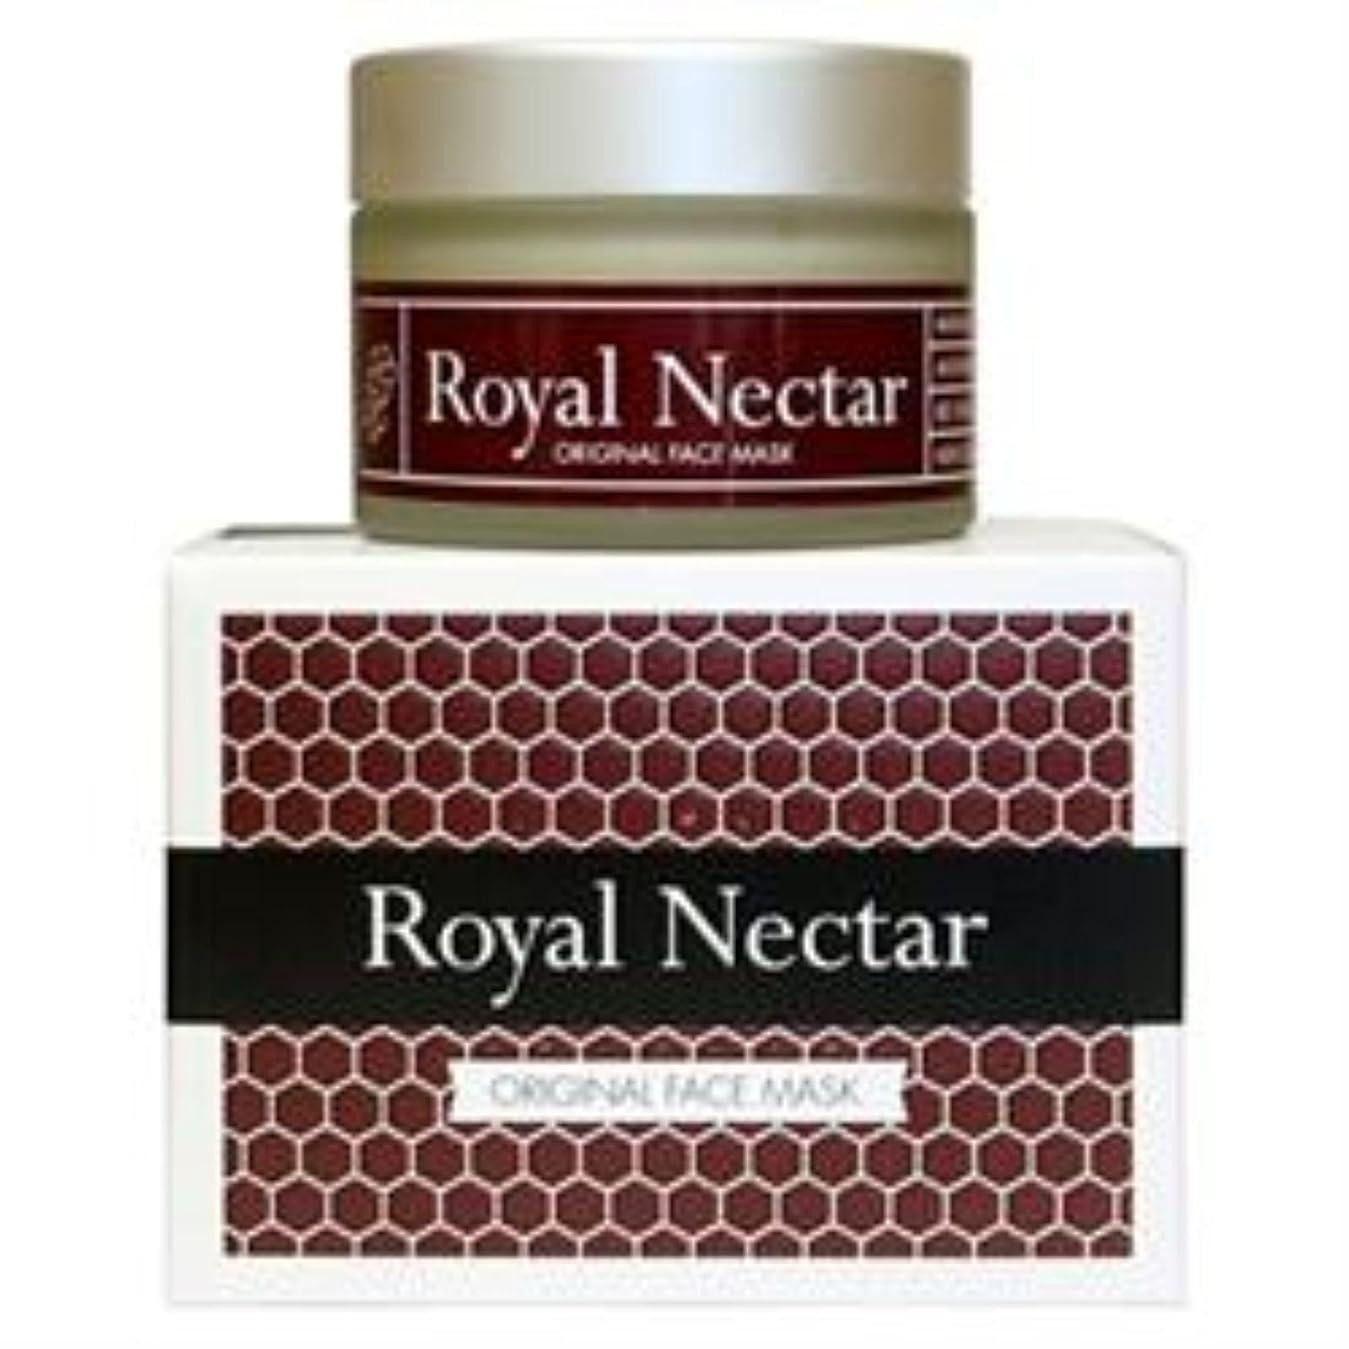 周術期状態第五Nelson Honey Royal Nectar Face Mask 50ml